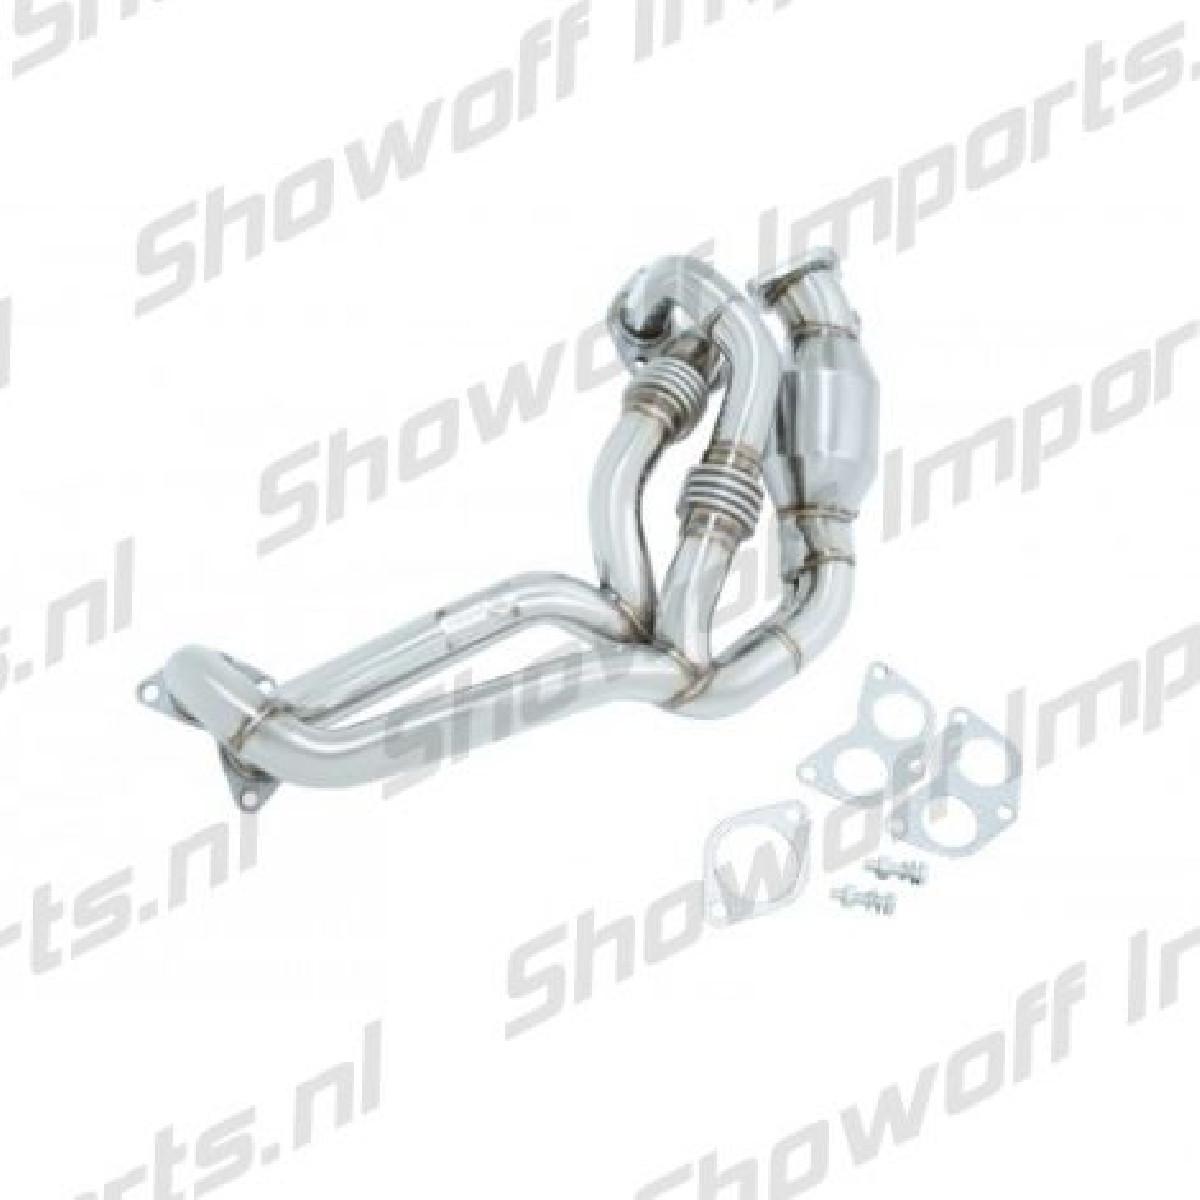 Subaru BRZ Manzo Stainless Steel Header + Cat